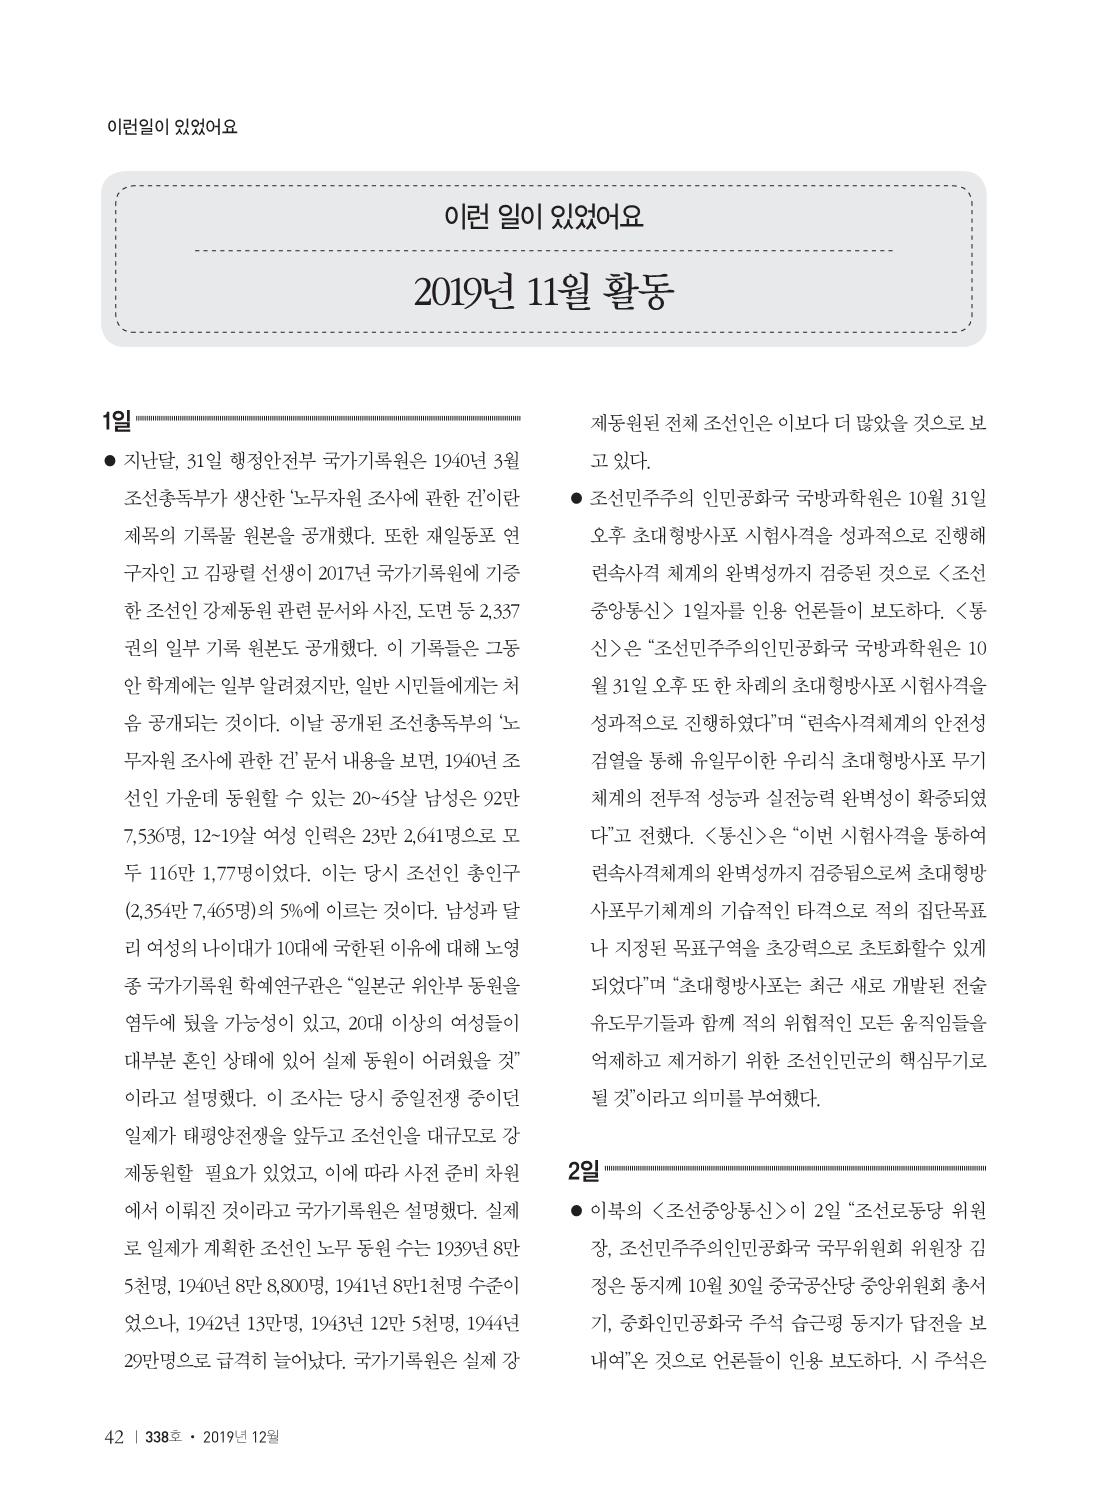 5802db1f-6a90-451c-ac2e-da2a23bee939.pdf-0044.jpg